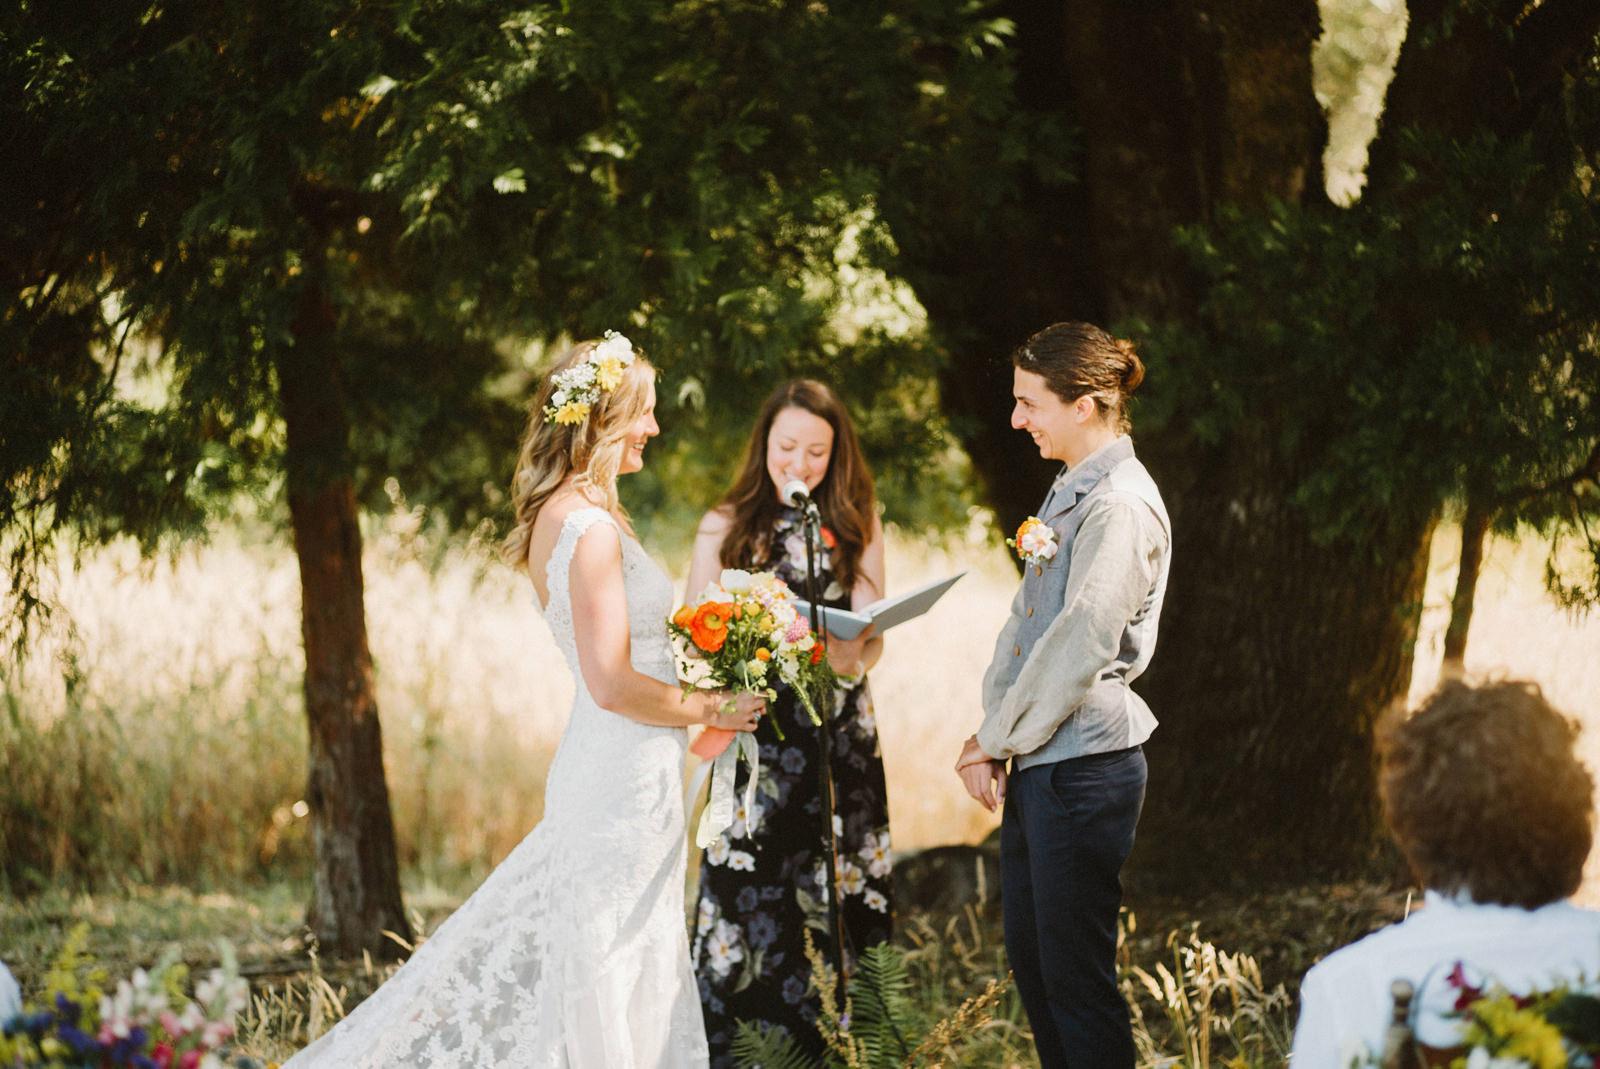 rivers-bend-retreat-wedding-024 RIVER'S BEND RETREAT WEDDING